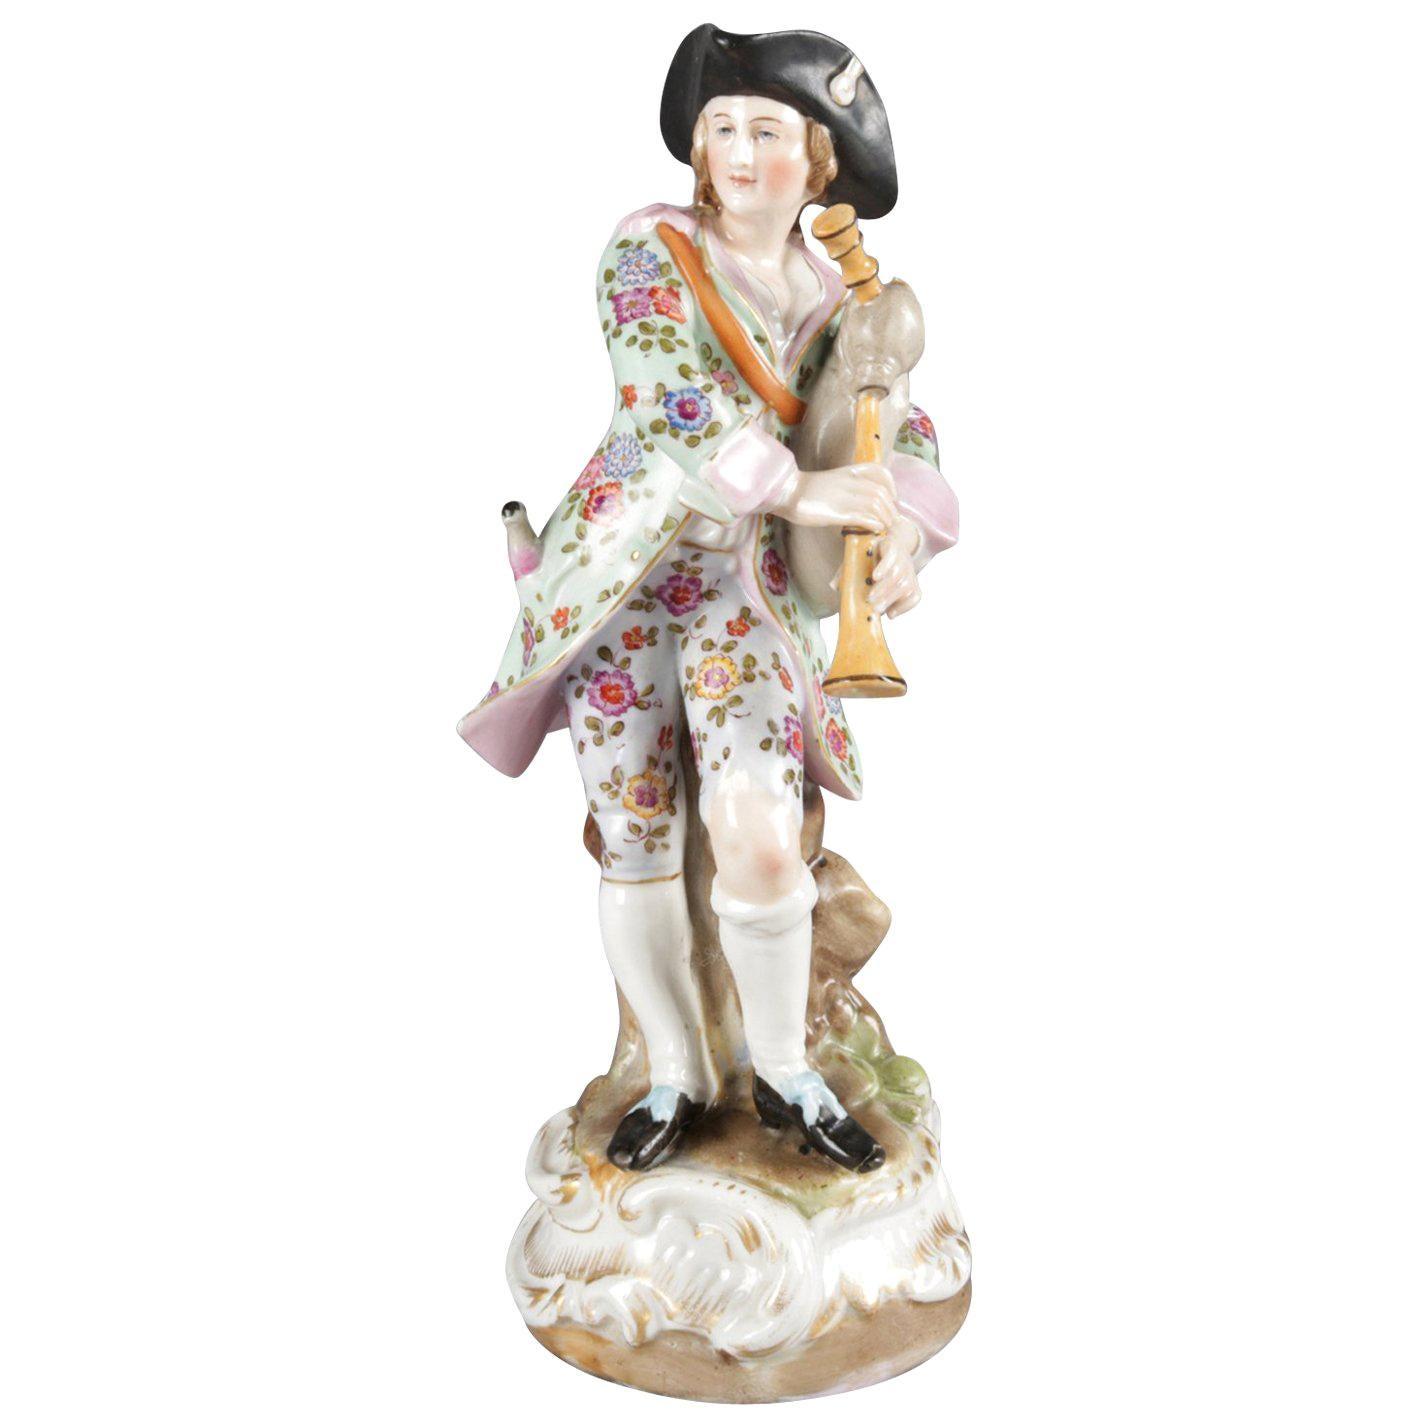 Antique German Meissen School Hand Painted and Gilt Porcelain Bagpiper Figure